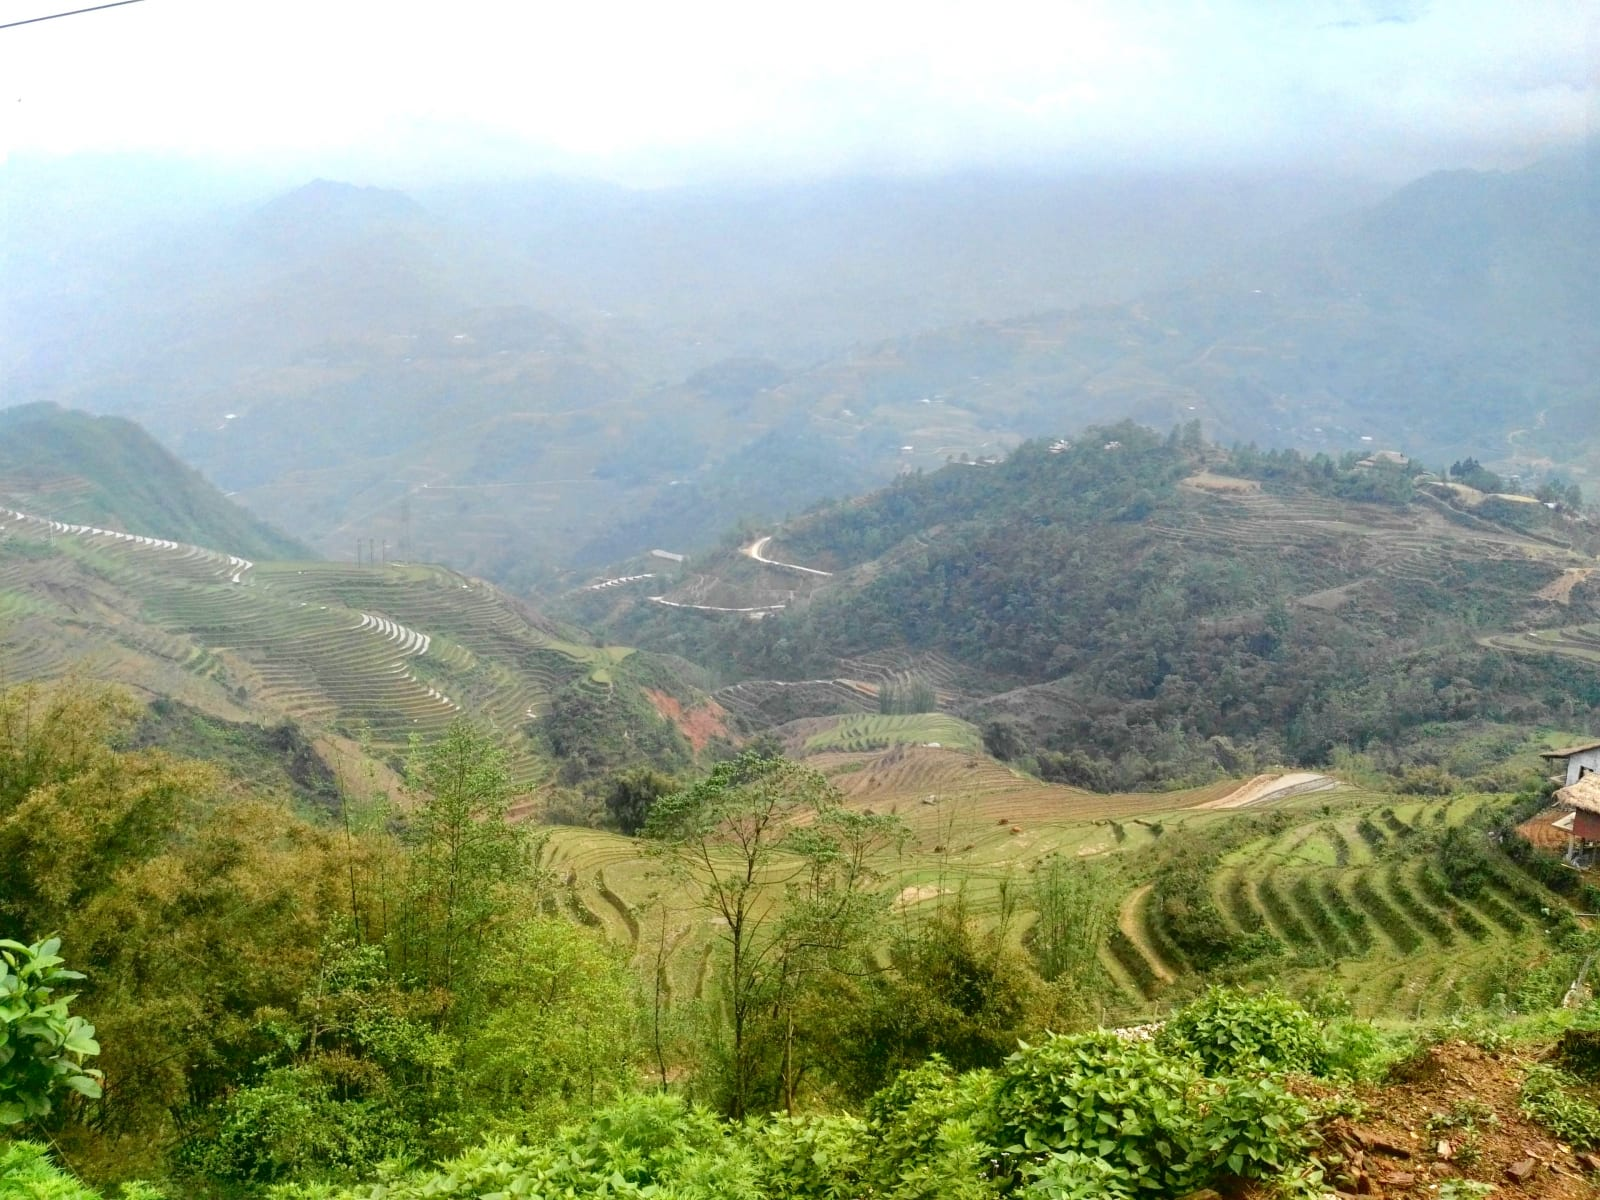 Cestou do vesniček za Lao Chai a dál, Sapa, Vietnam